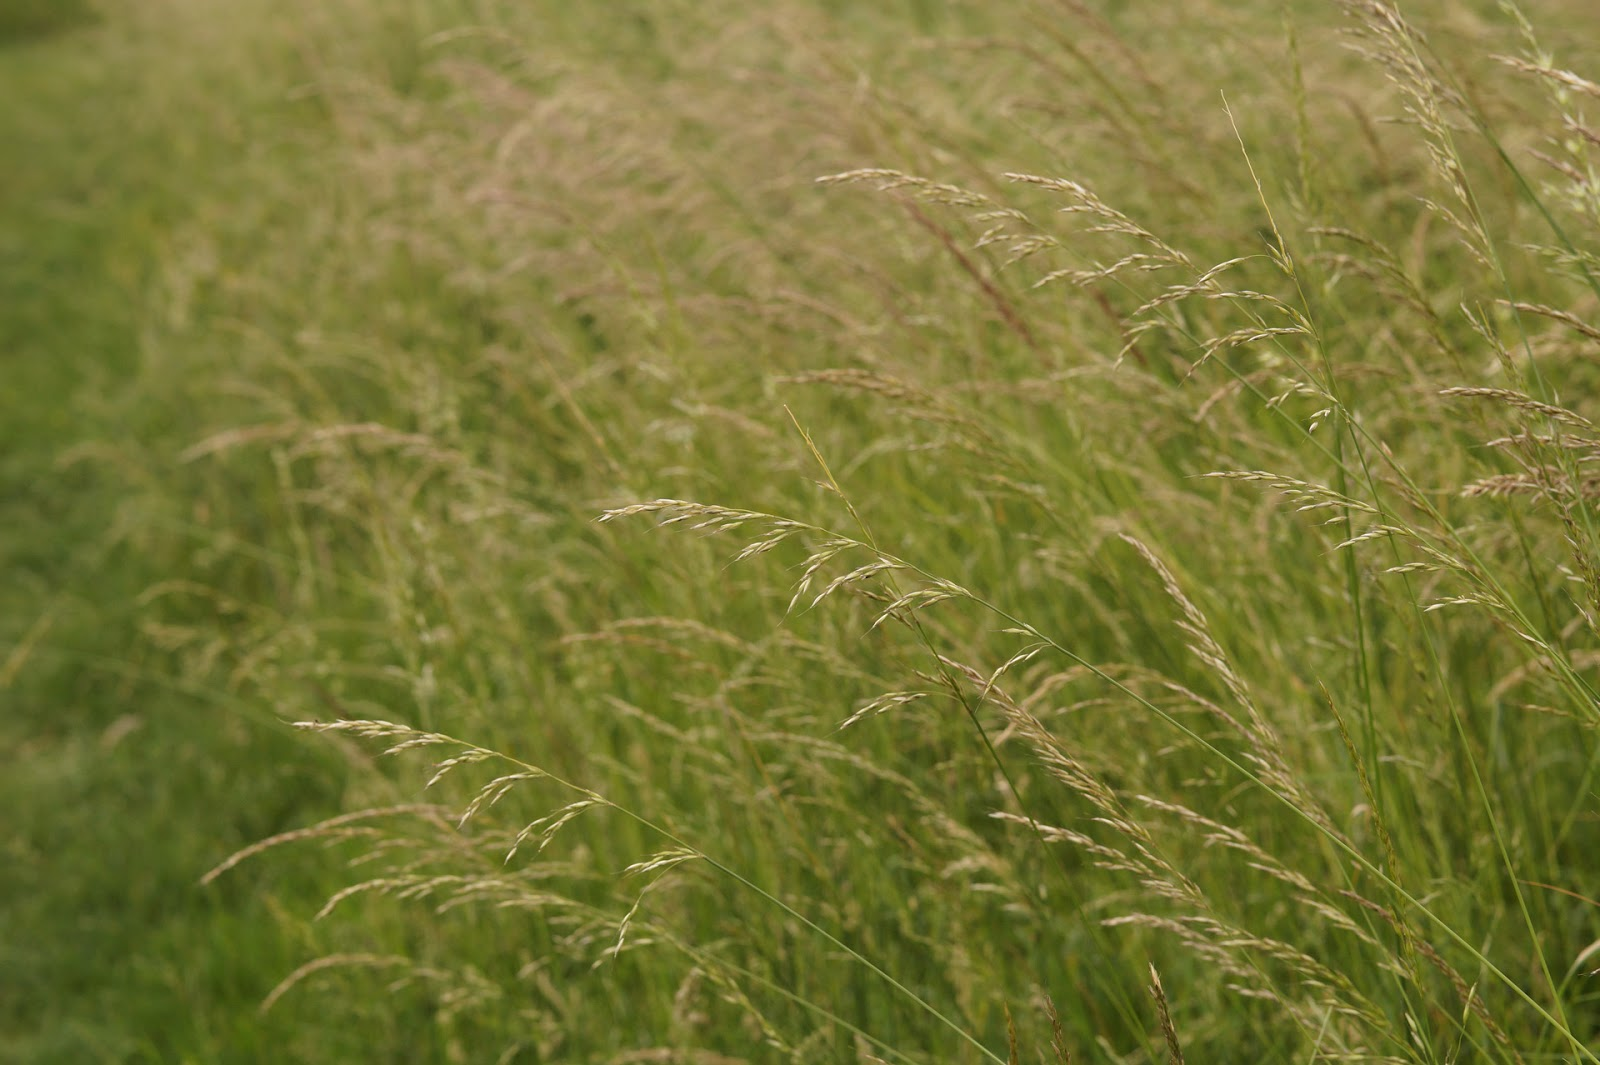 The whispering long grass sophie in the sticks for Like long grasses